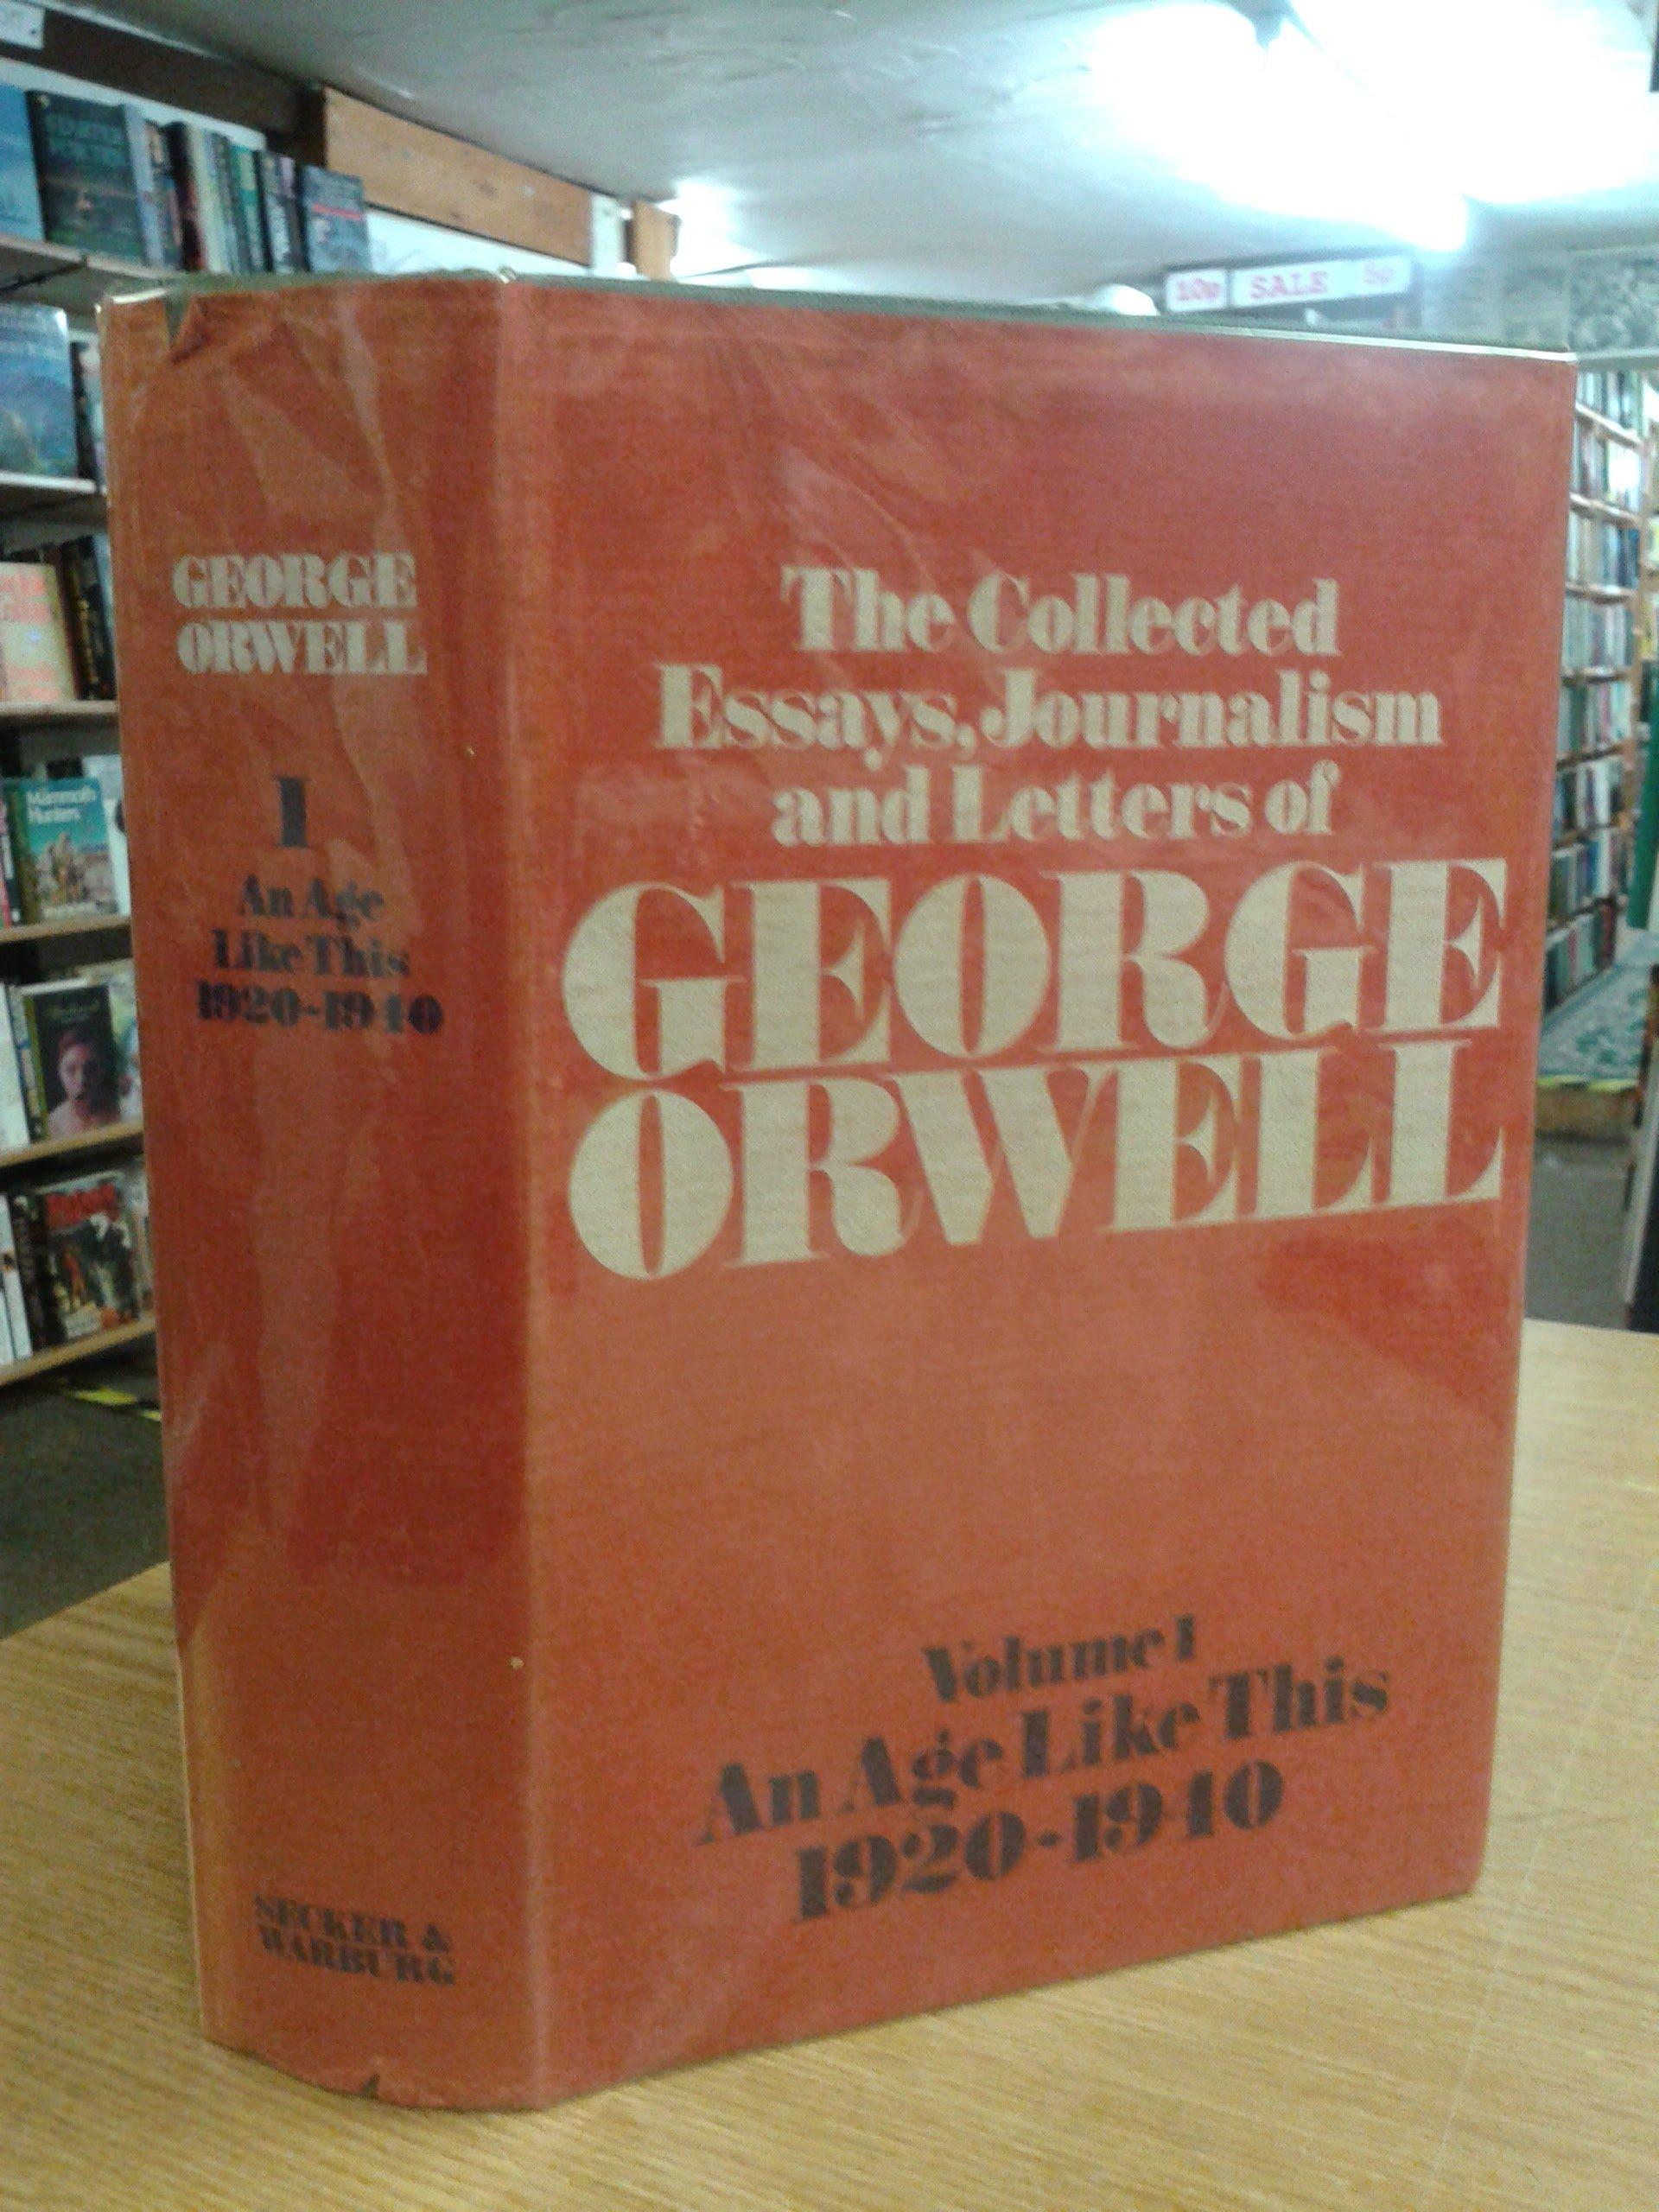 009 Essay Example 910v7kdx32bl Orwell Singular Essays Themes Epub George Pdf Download Full